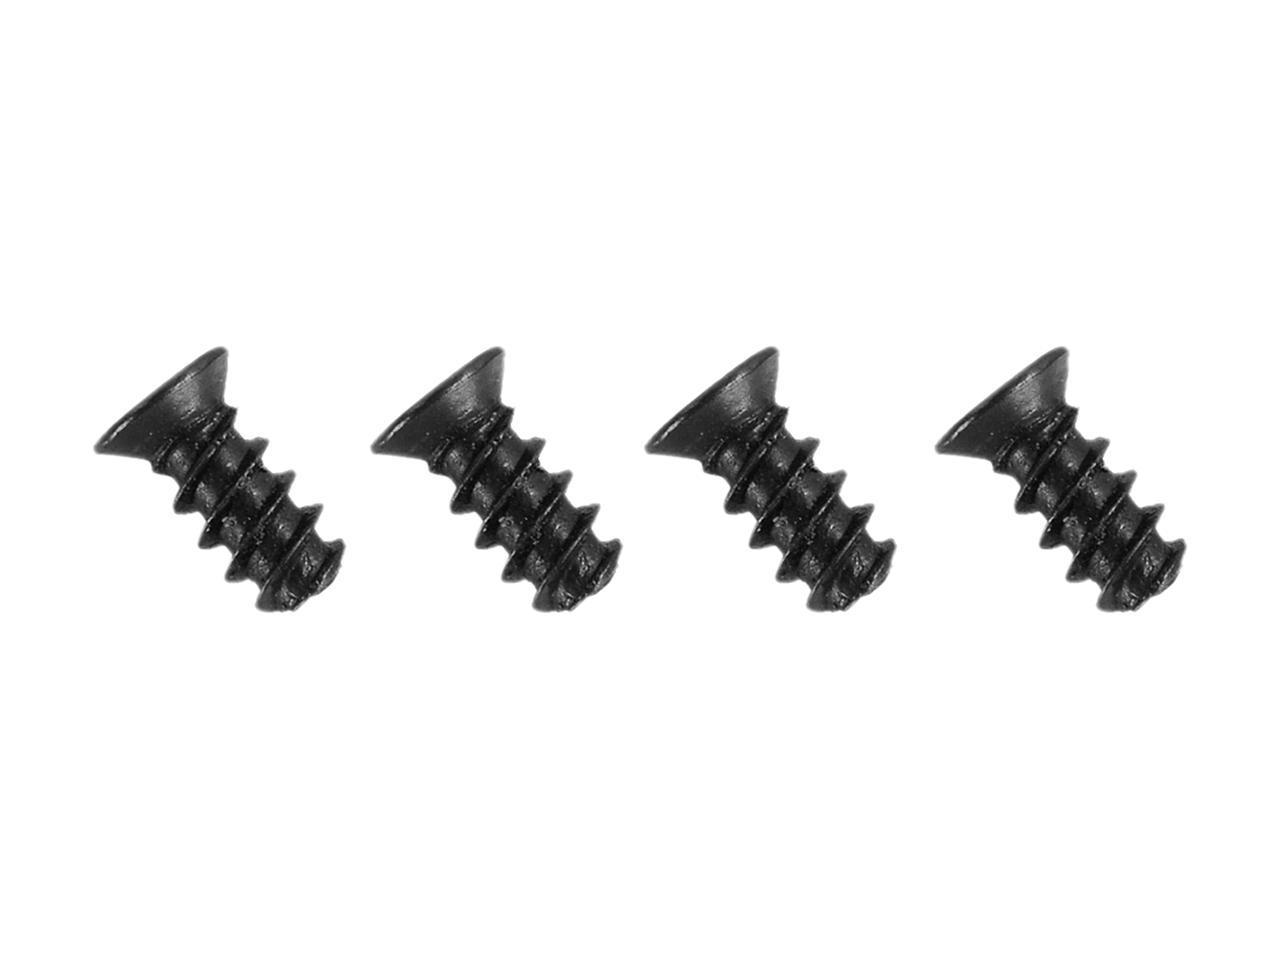 Deepcool Xfan 200rd Rubber Coating 200mm 3 Pin Amp 4 Pin